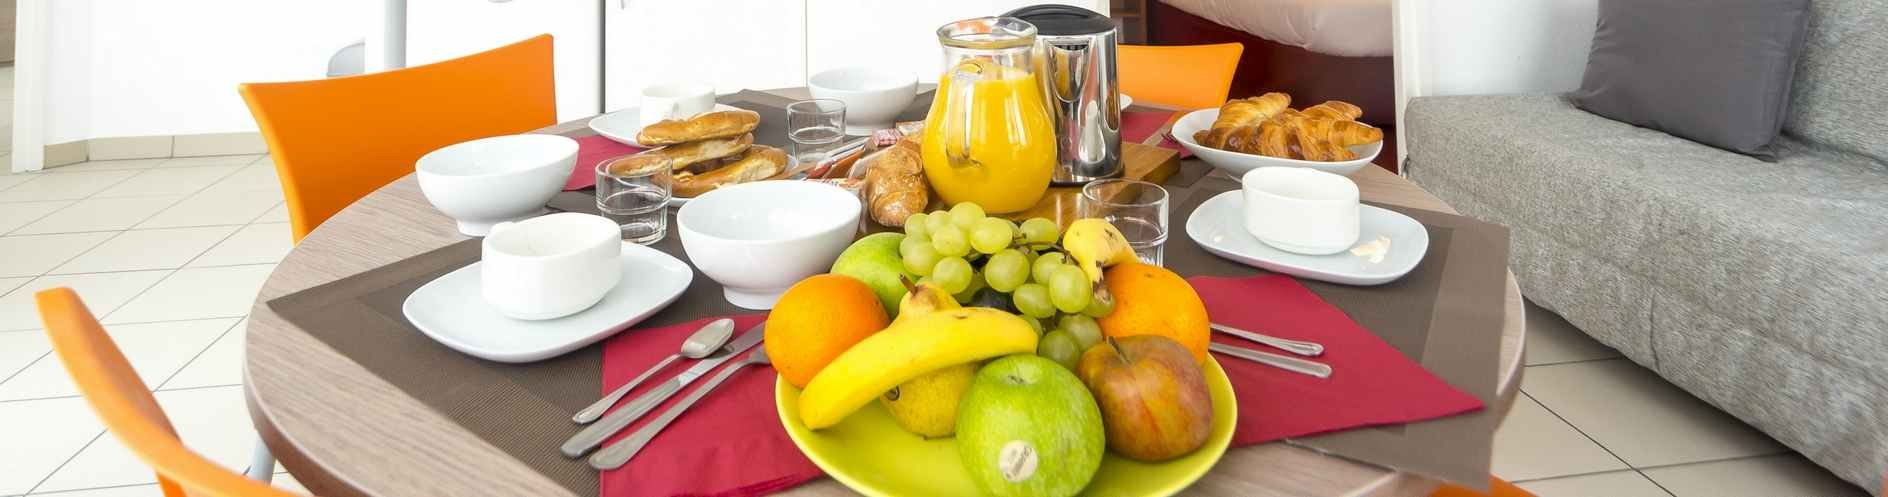 residence-cerise-strasbourg-petit-dejeuner-appartement-2.jpg